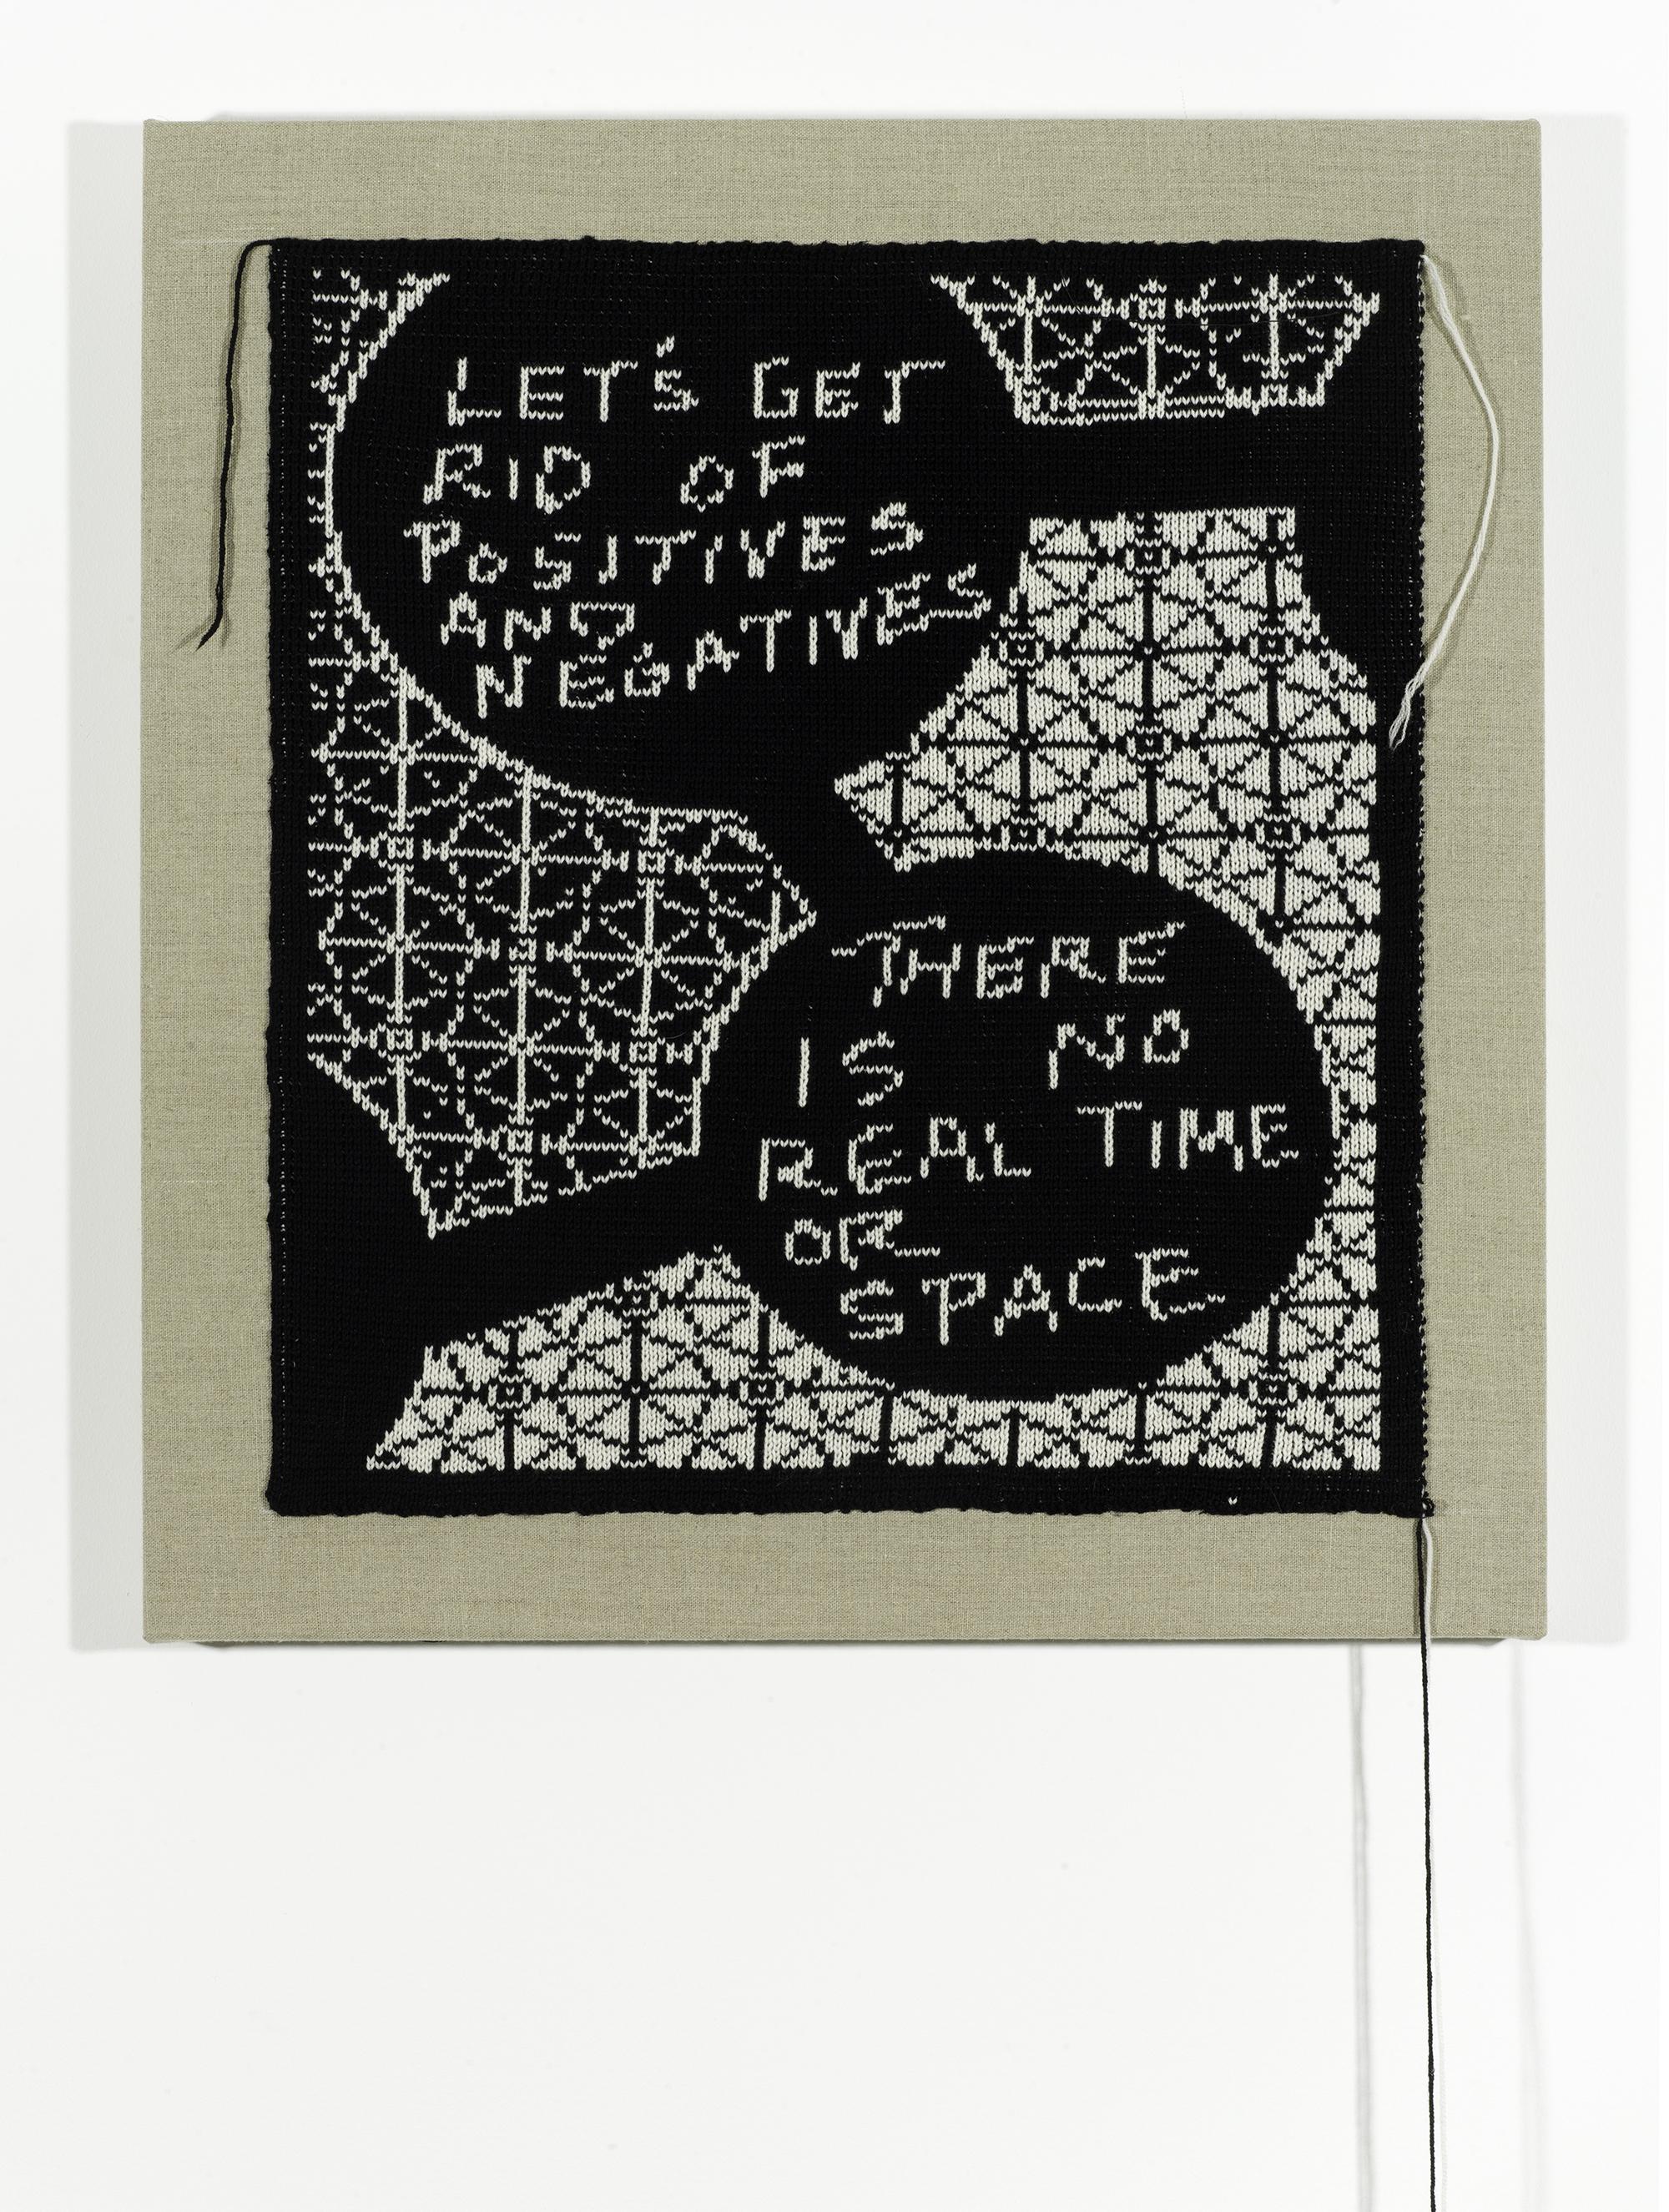 Let's Get Rid of Positives and Negatives (Negative), 2014